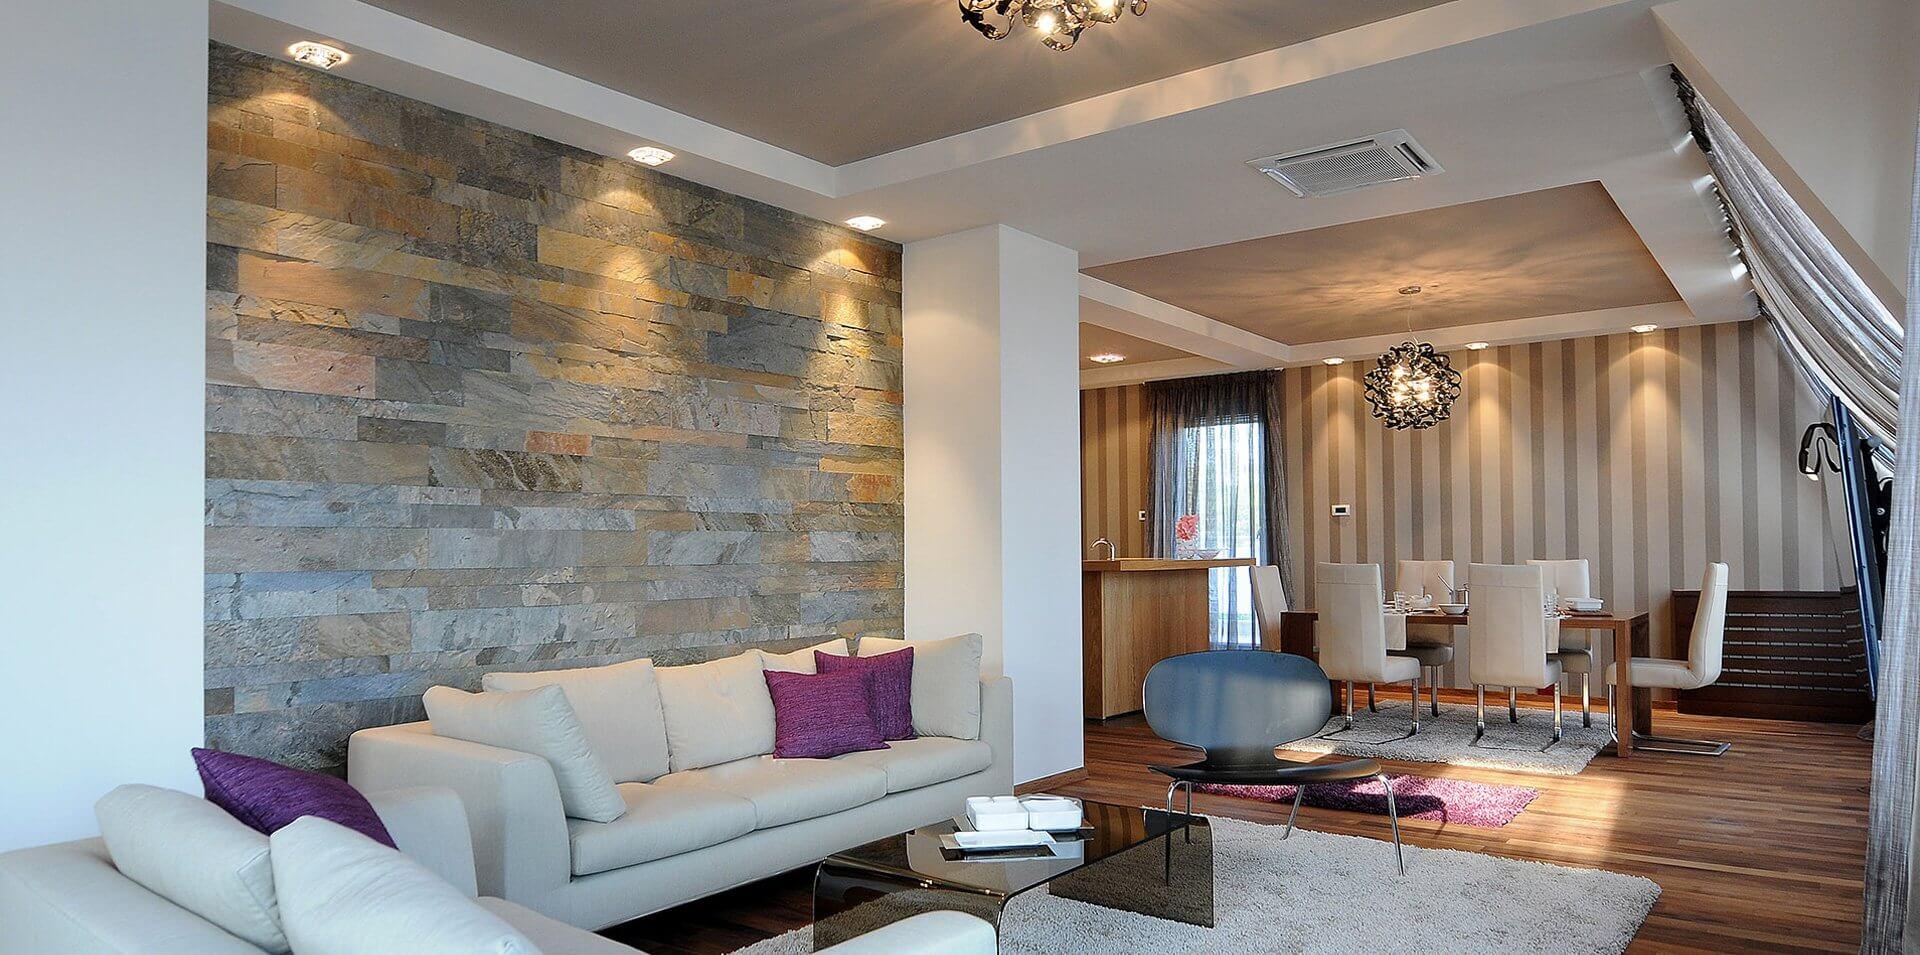 Monteith interiors creative interior design service in for Home interior website